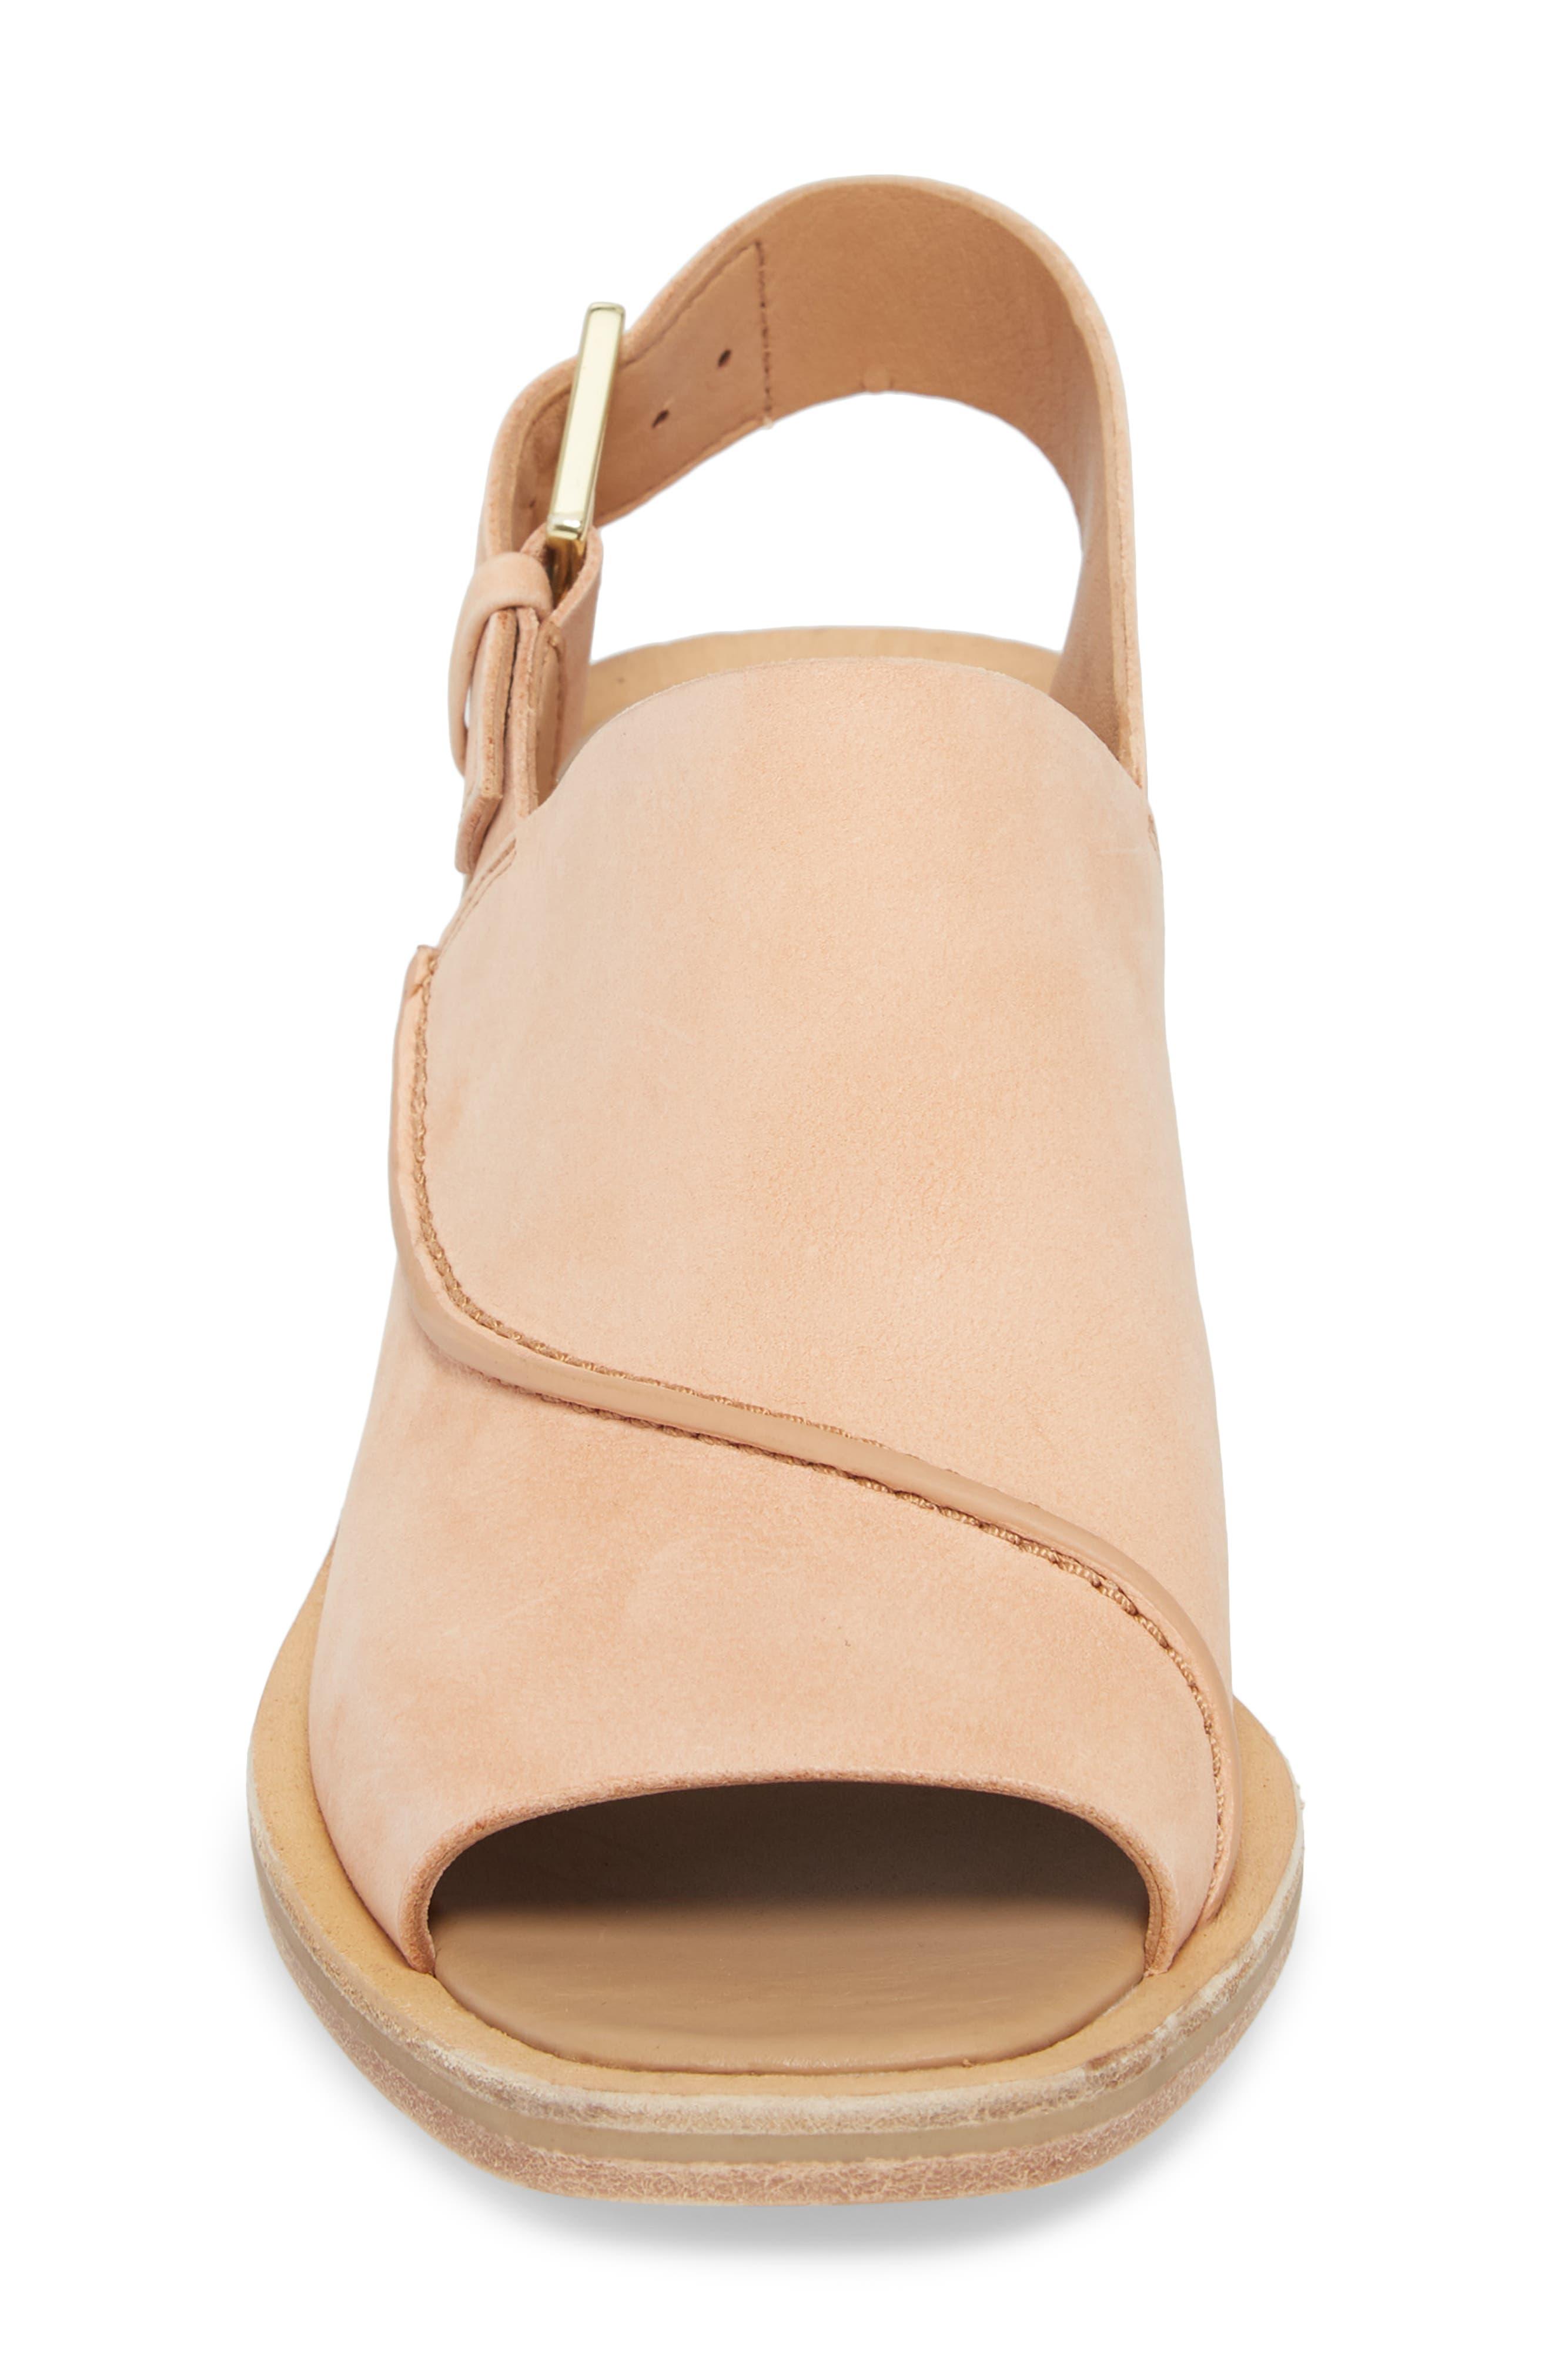 Clarks Bermudan Block Heel Sandal,                             Alternate thumbnail 4, color,                             Sandstone Nubuck Leather